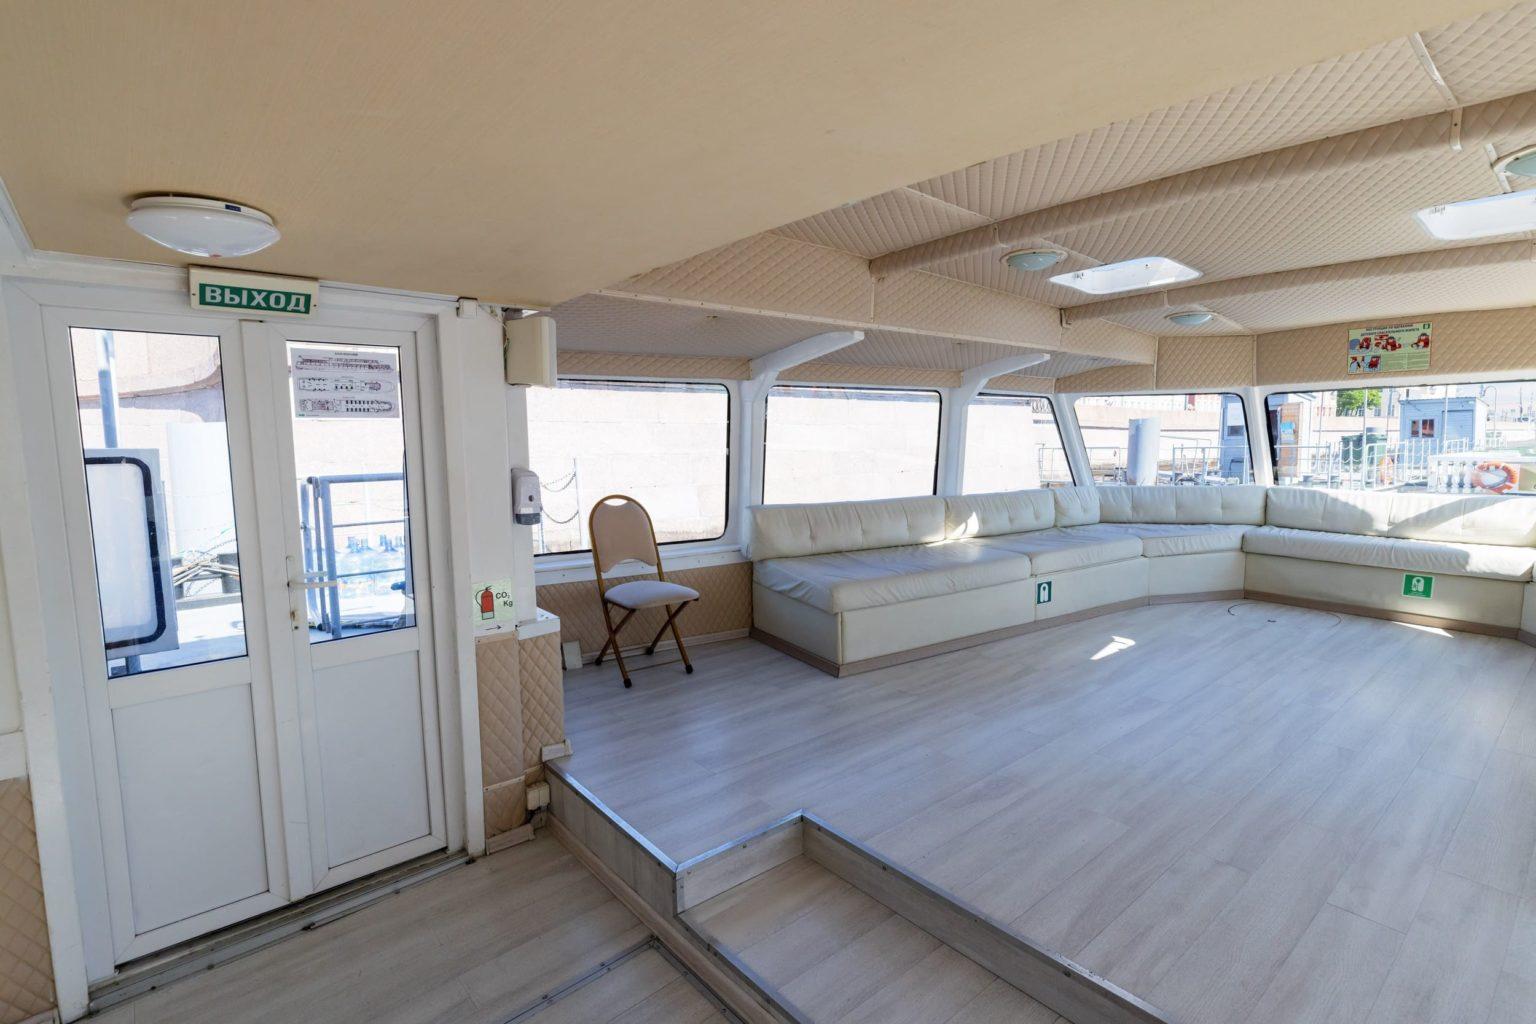 Теплоход Гранд Марин - фото верхней палубы